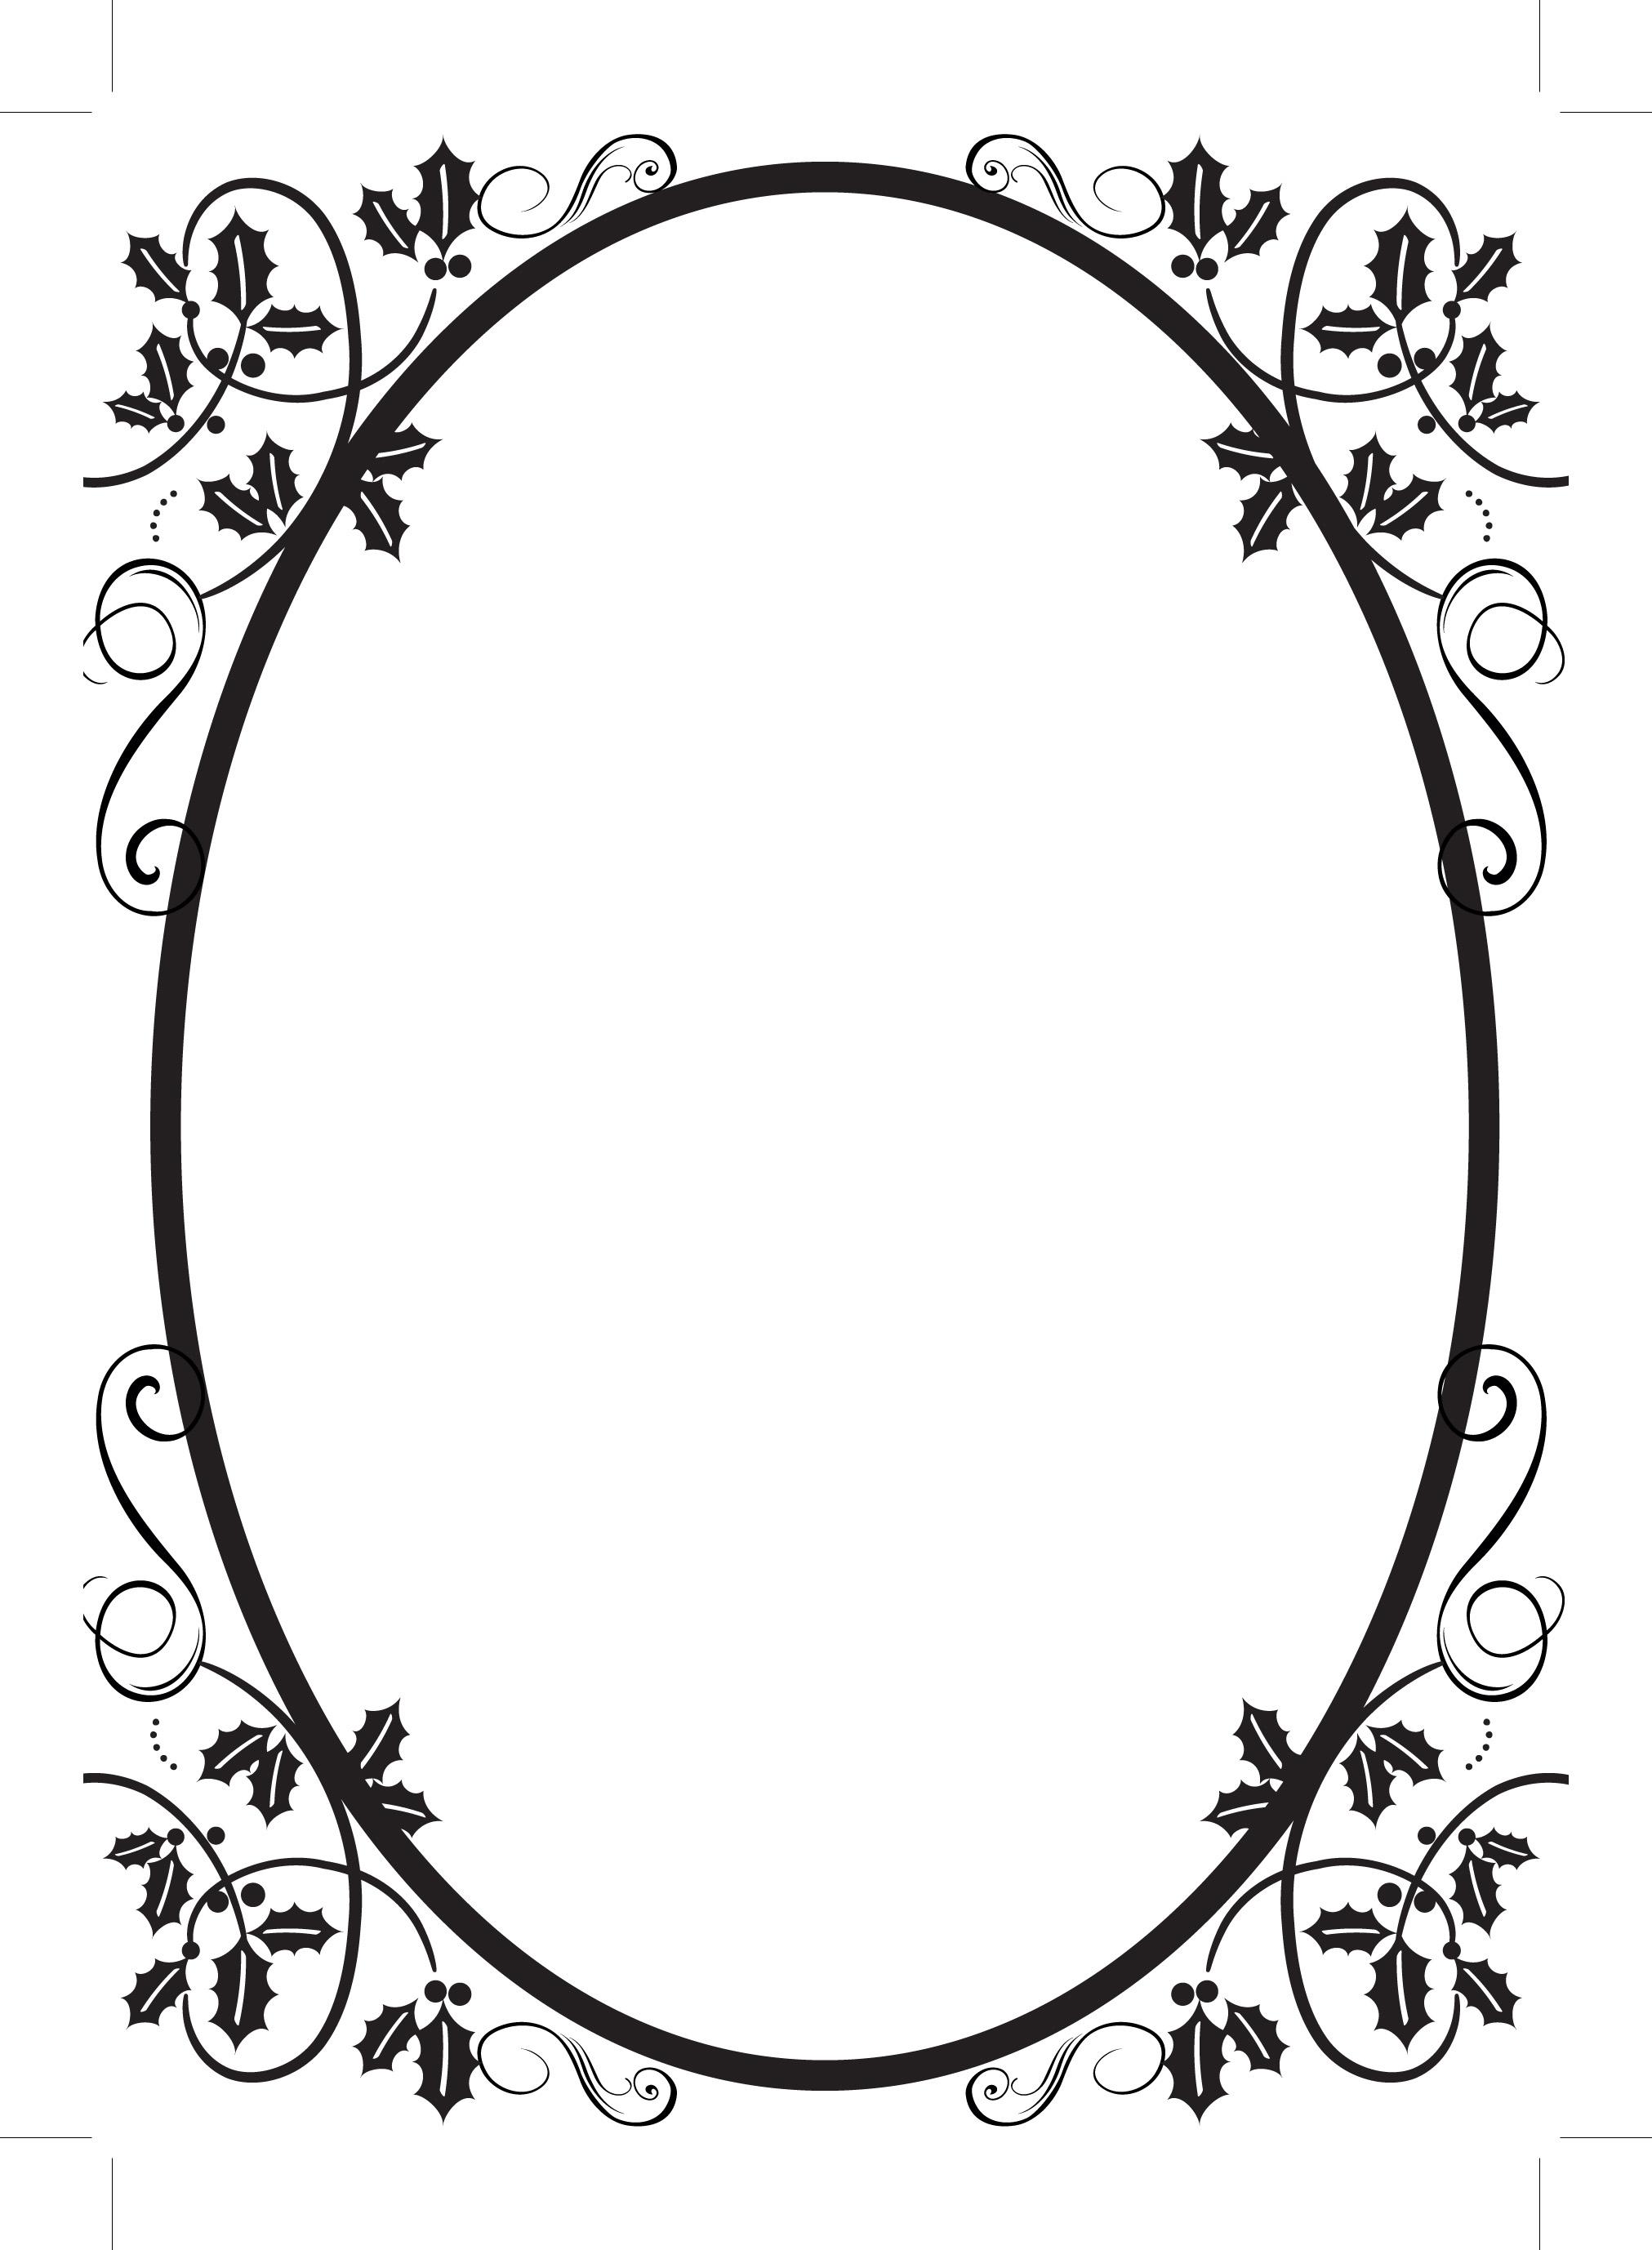 2023x2755 Free Flourish Clip Art Borders Random Search